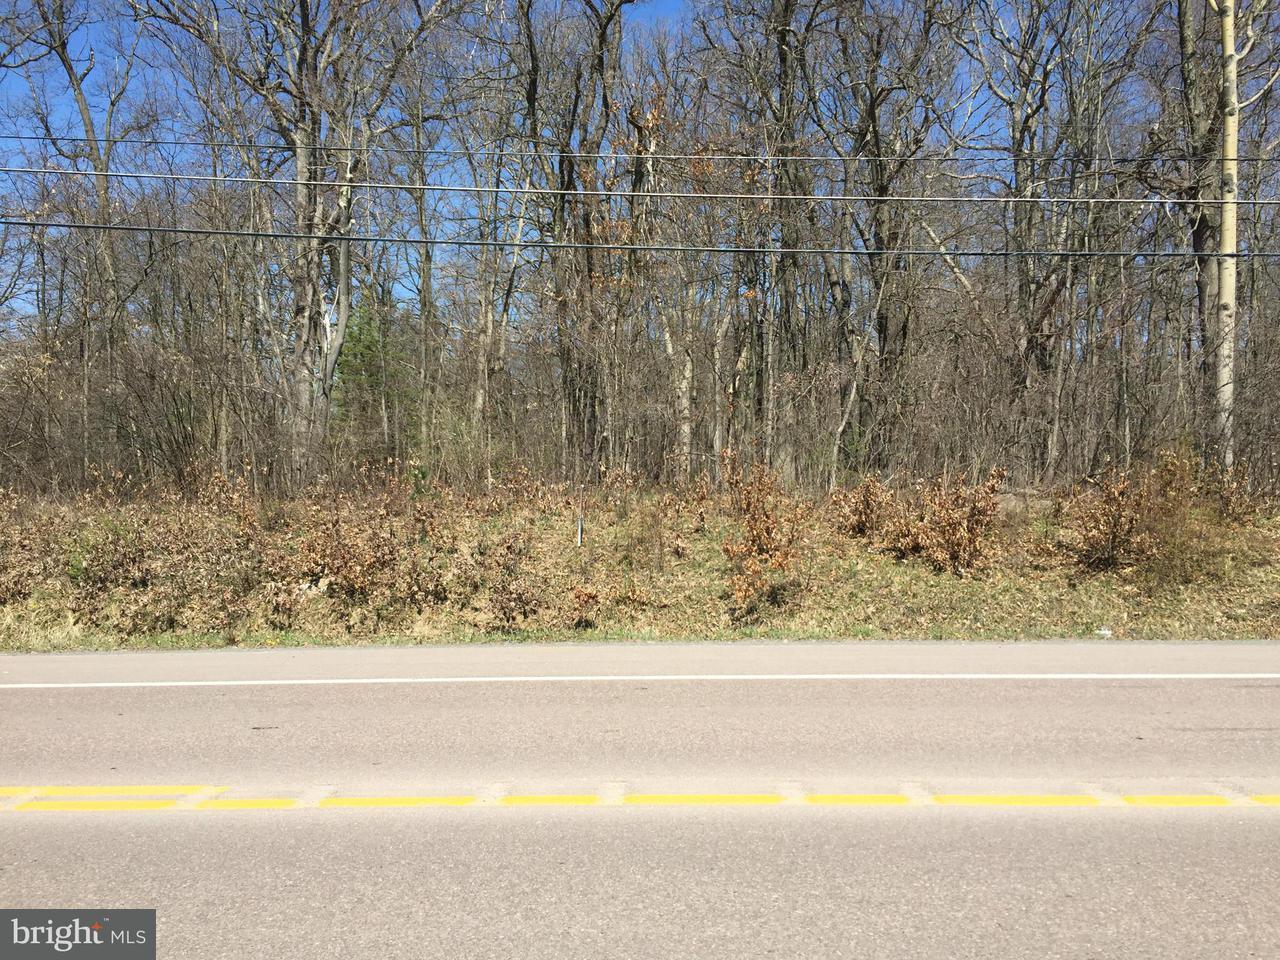 Land for Sale at Rt 135 N Mt Lake Mountain Lake Park, Maryland 21550 United States